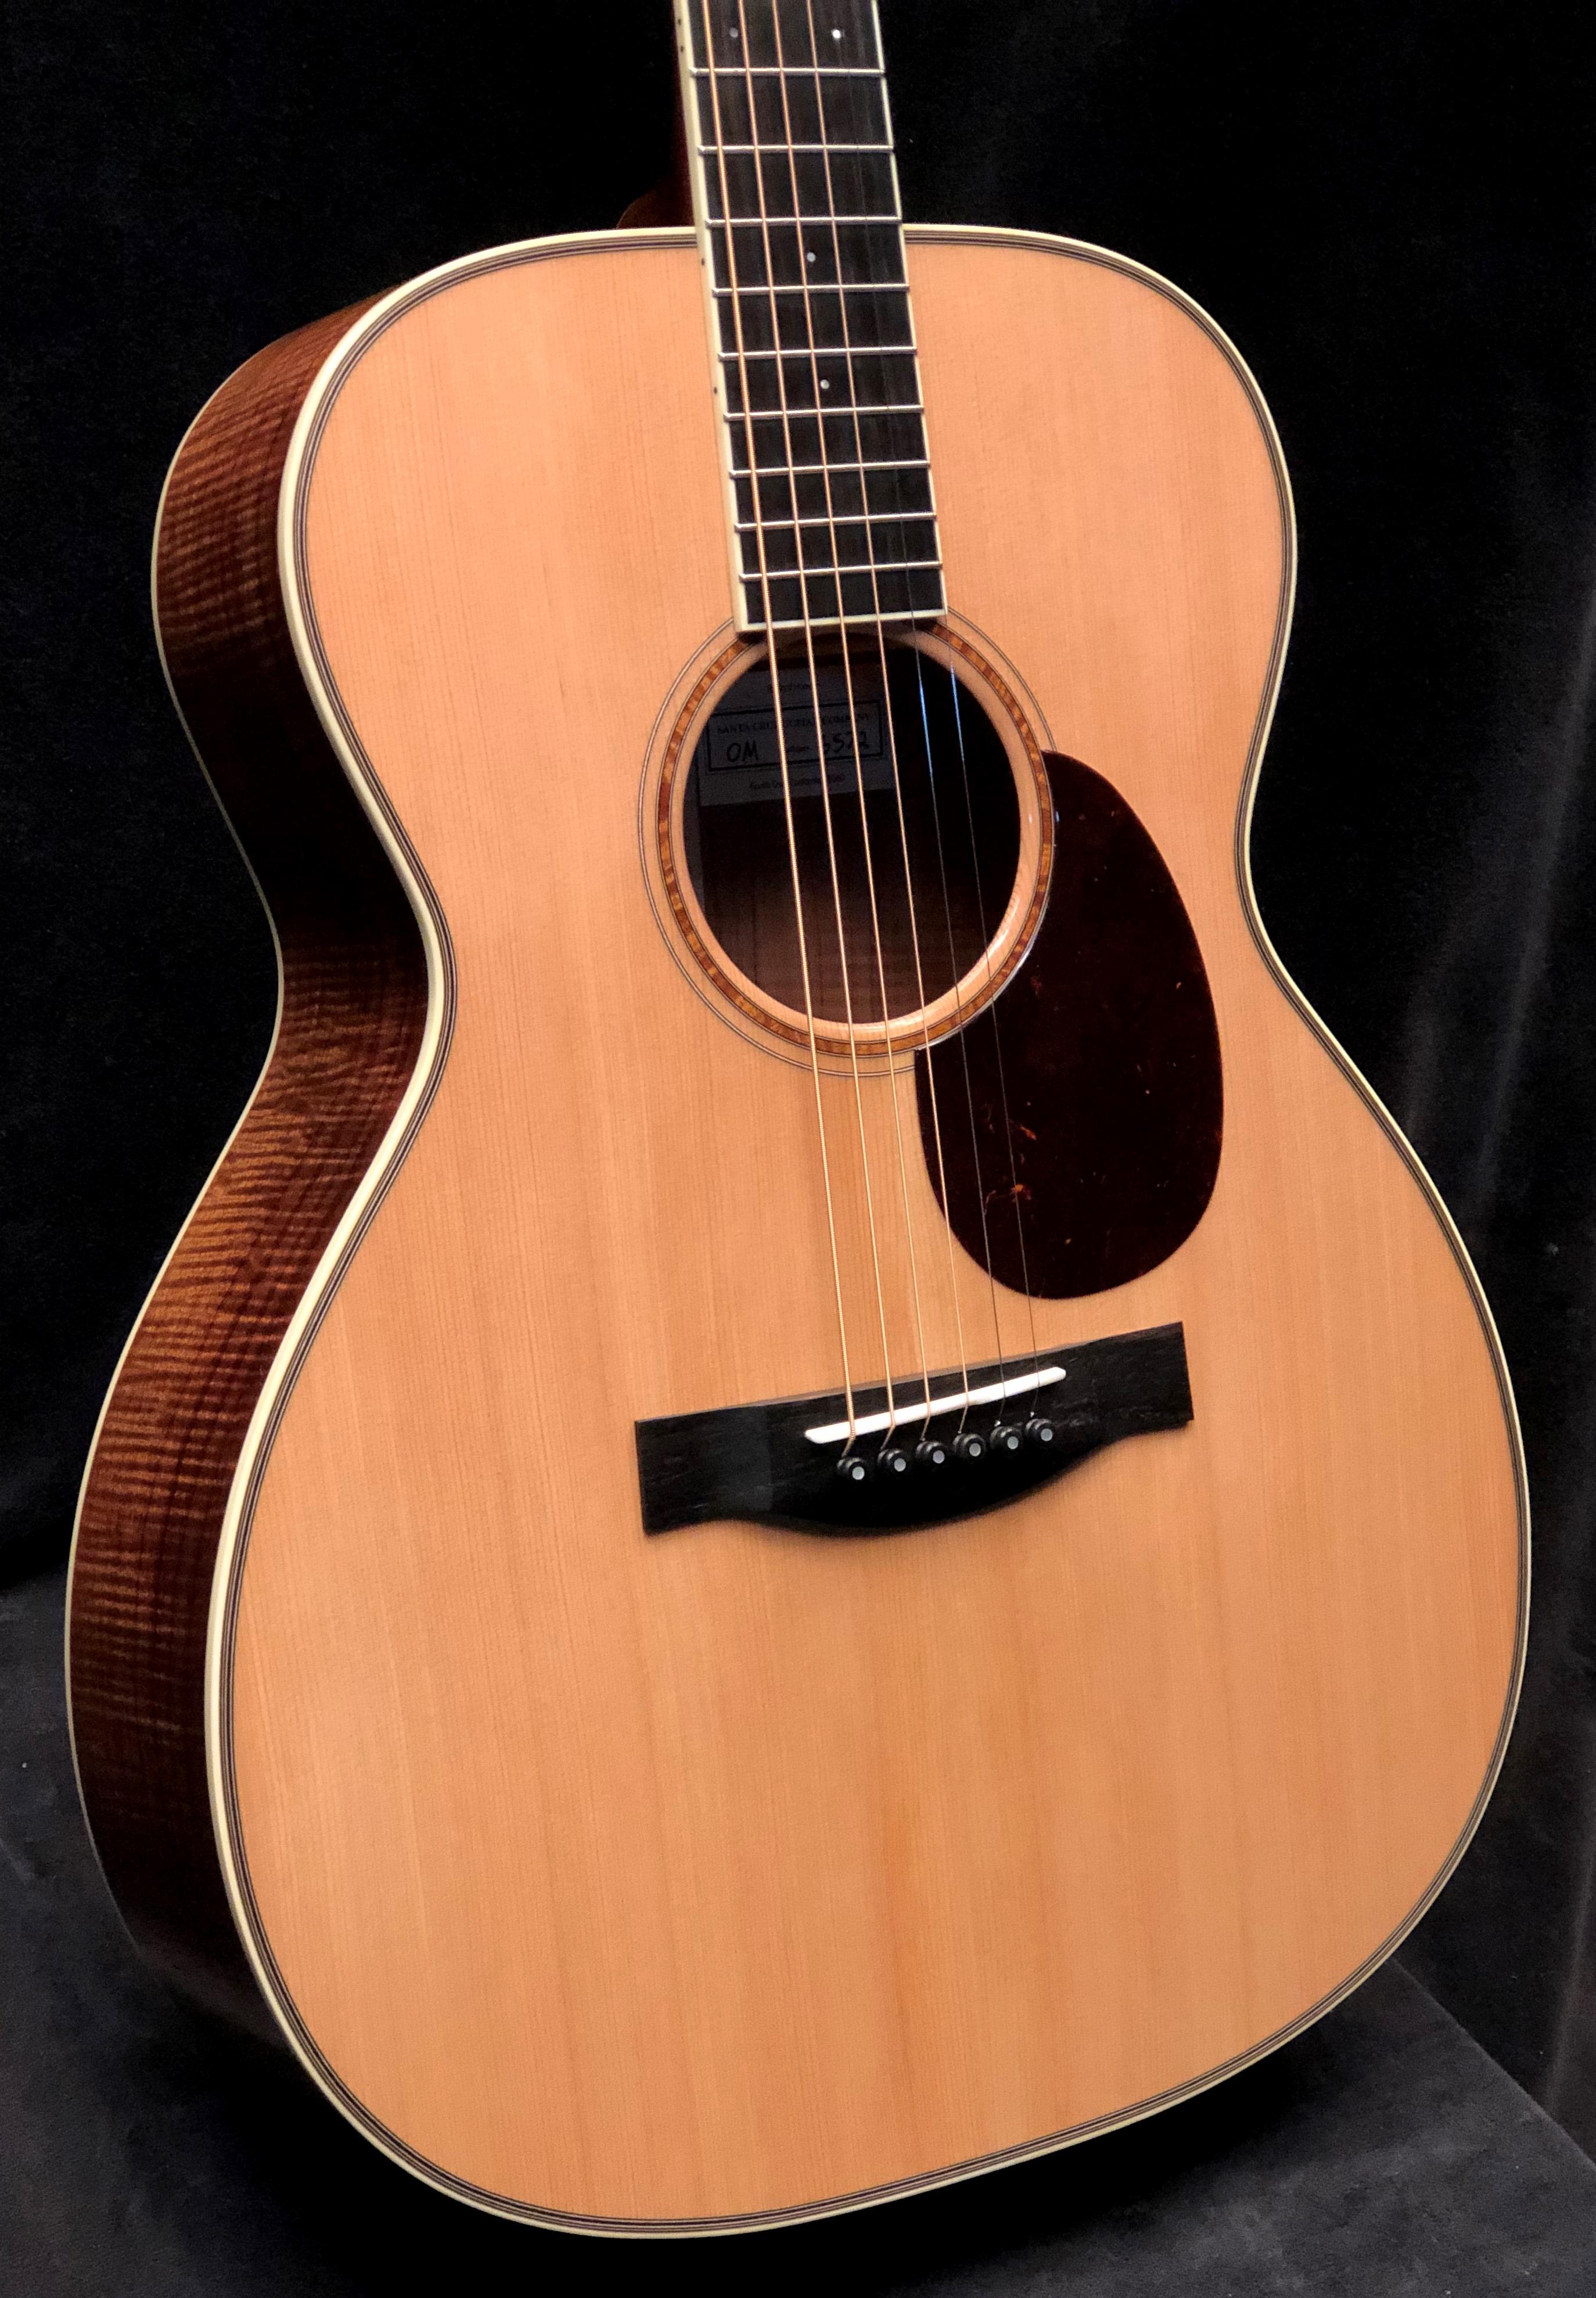 Just Shipped Tuesday December 11th: Custom OM Koa/Cedar